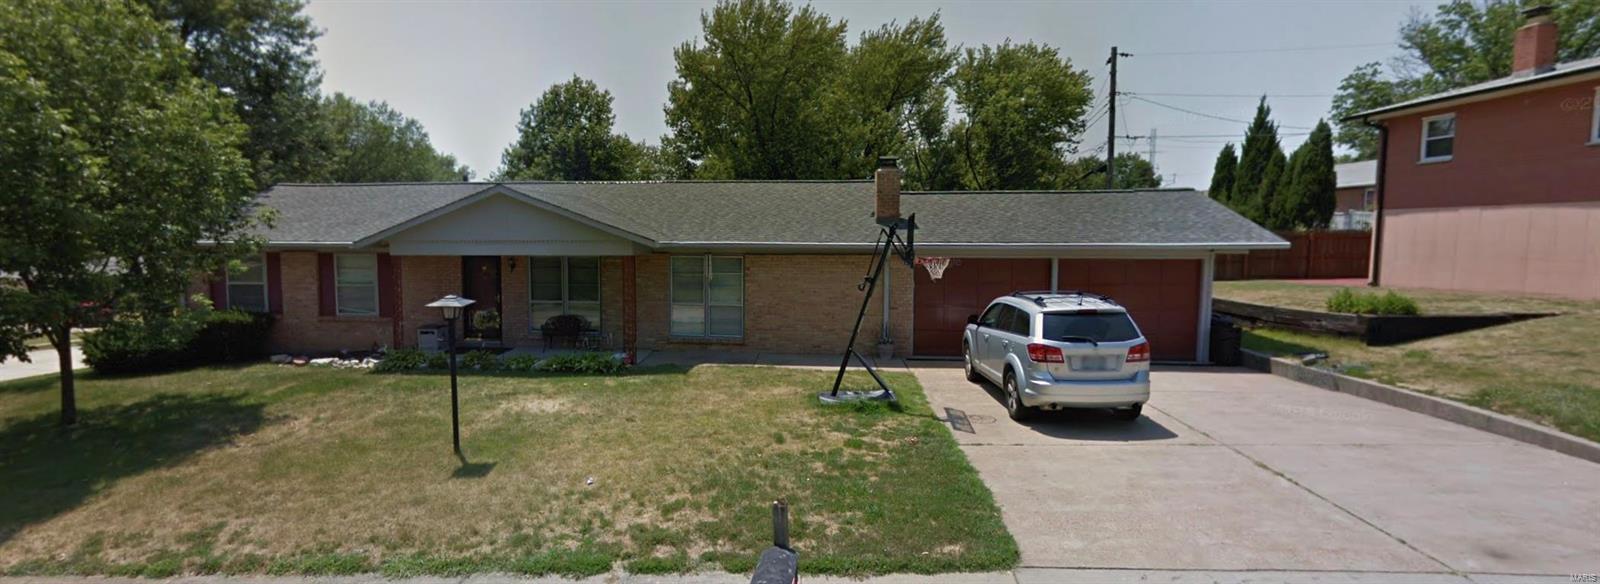 3307 Taylor Avenue Property Photo - Bridgeton, MO real estate listing